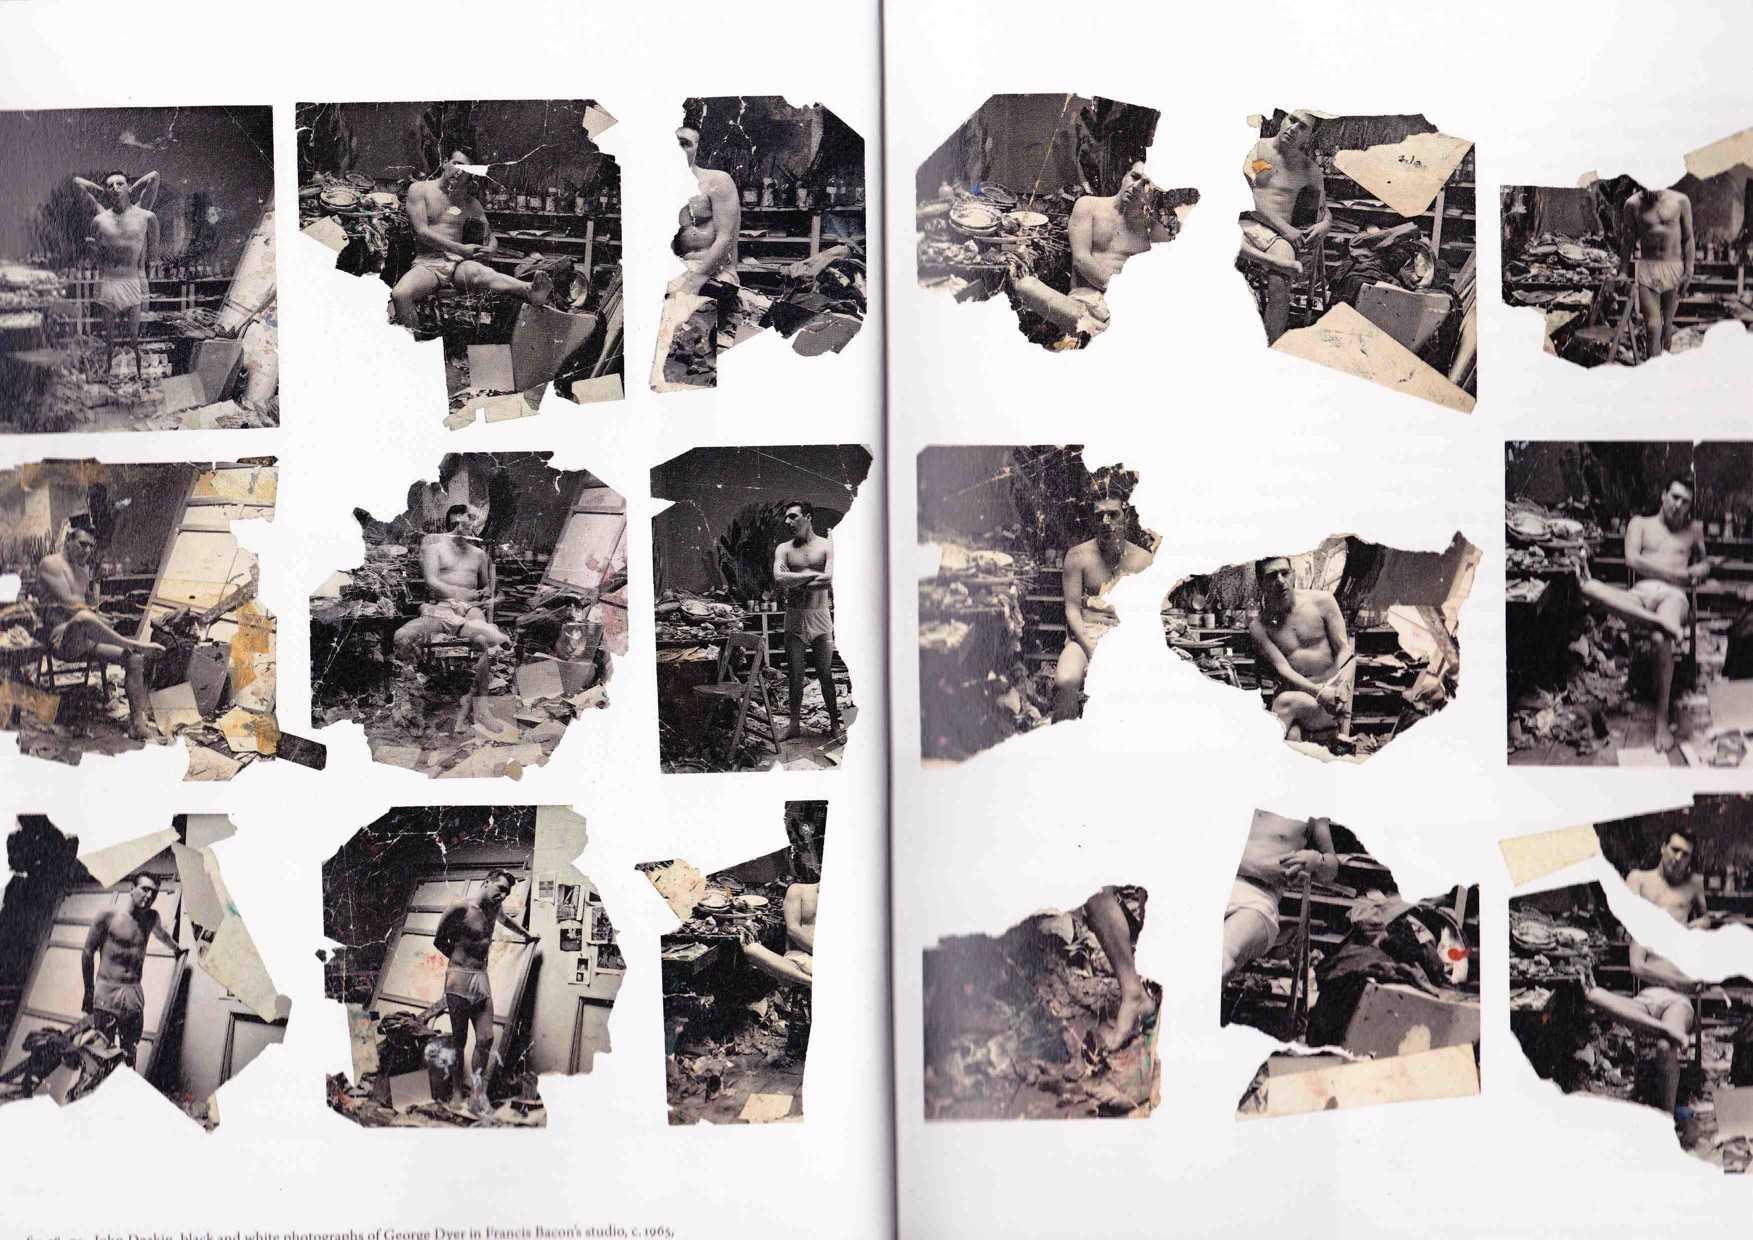 John Deakin, photos of George Dyer